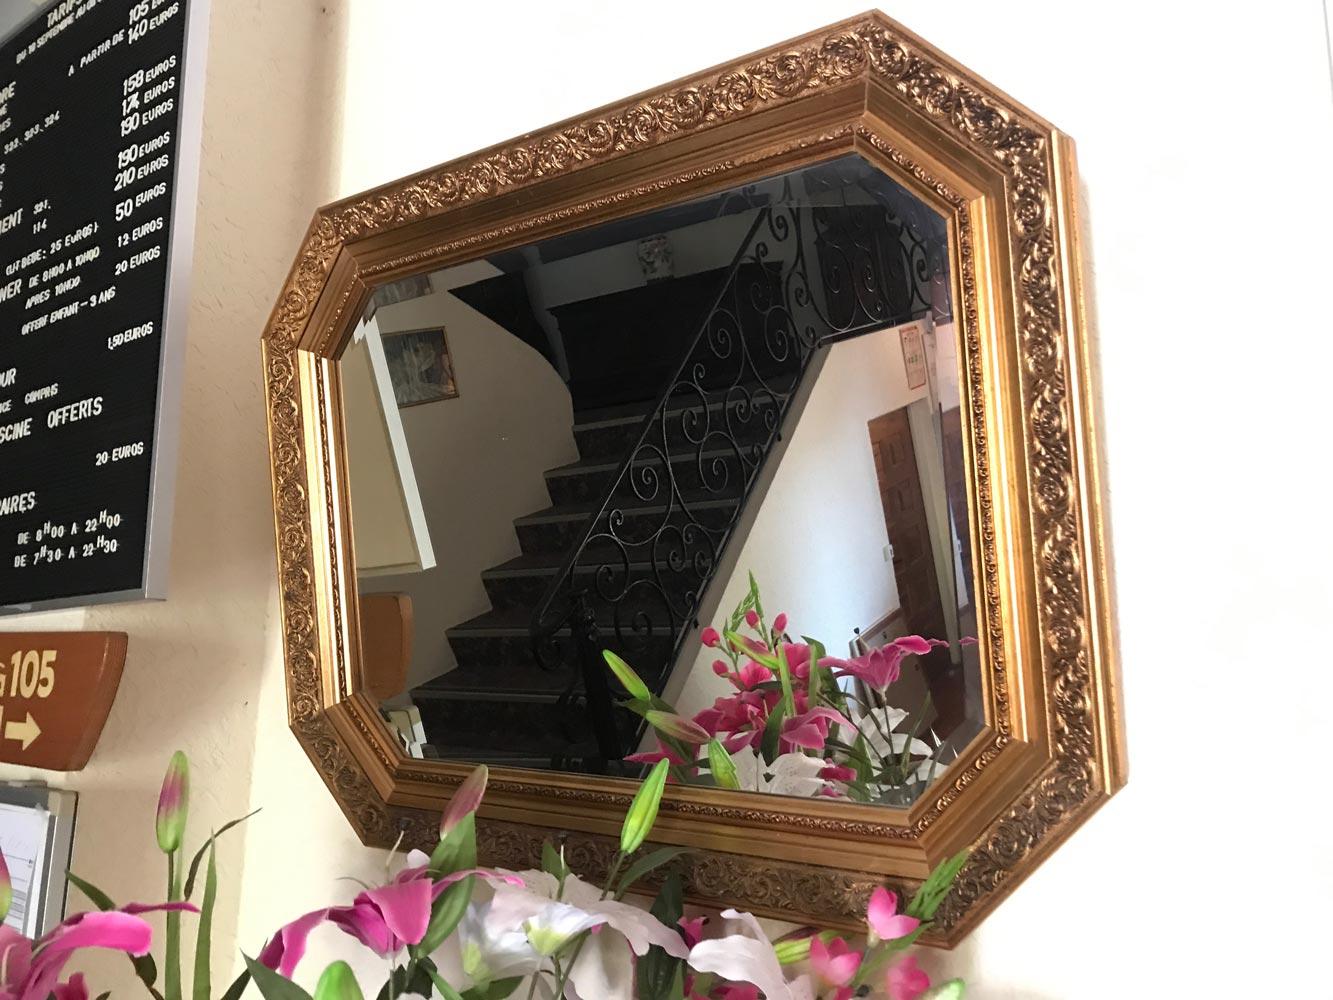 Miroir polygonal en bois et stuc dor glace biseaut e moderne 85 x 65 cm carvajal for Glace miroir moderne